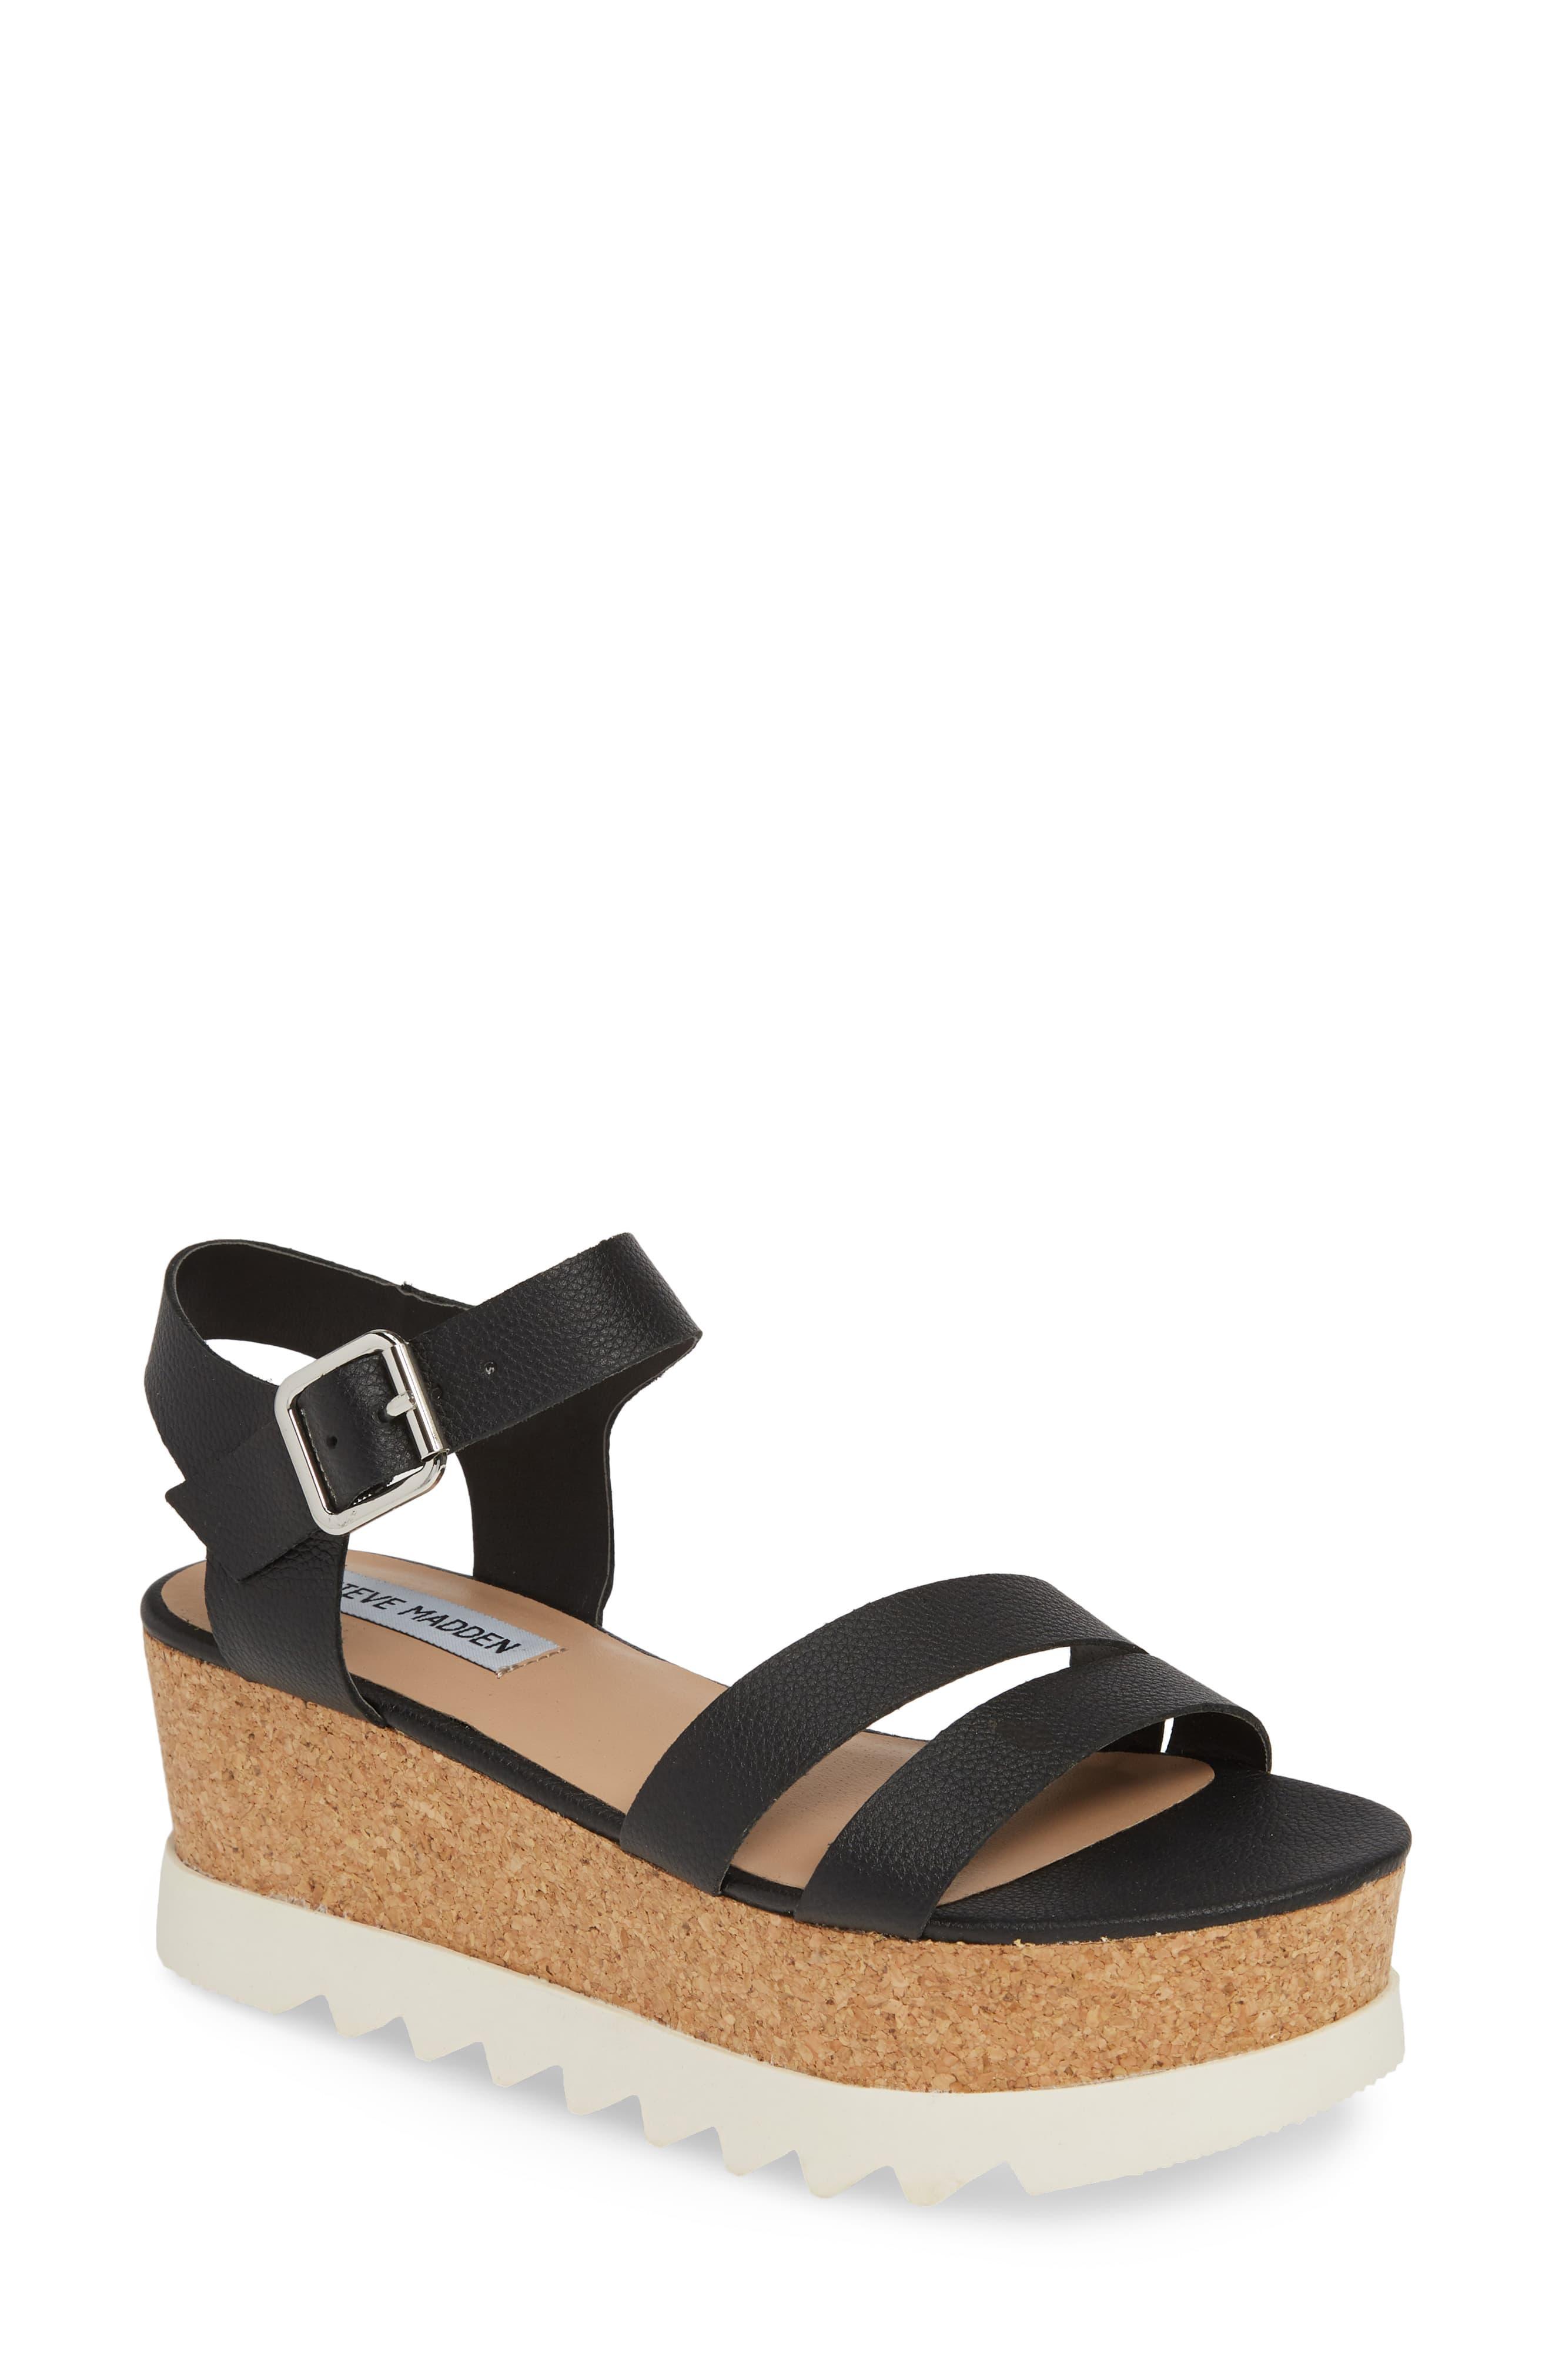 f395cfe2f202f Women's Steve Madden Keykey Platform Wedge Sandal, Size 6.5 M ...